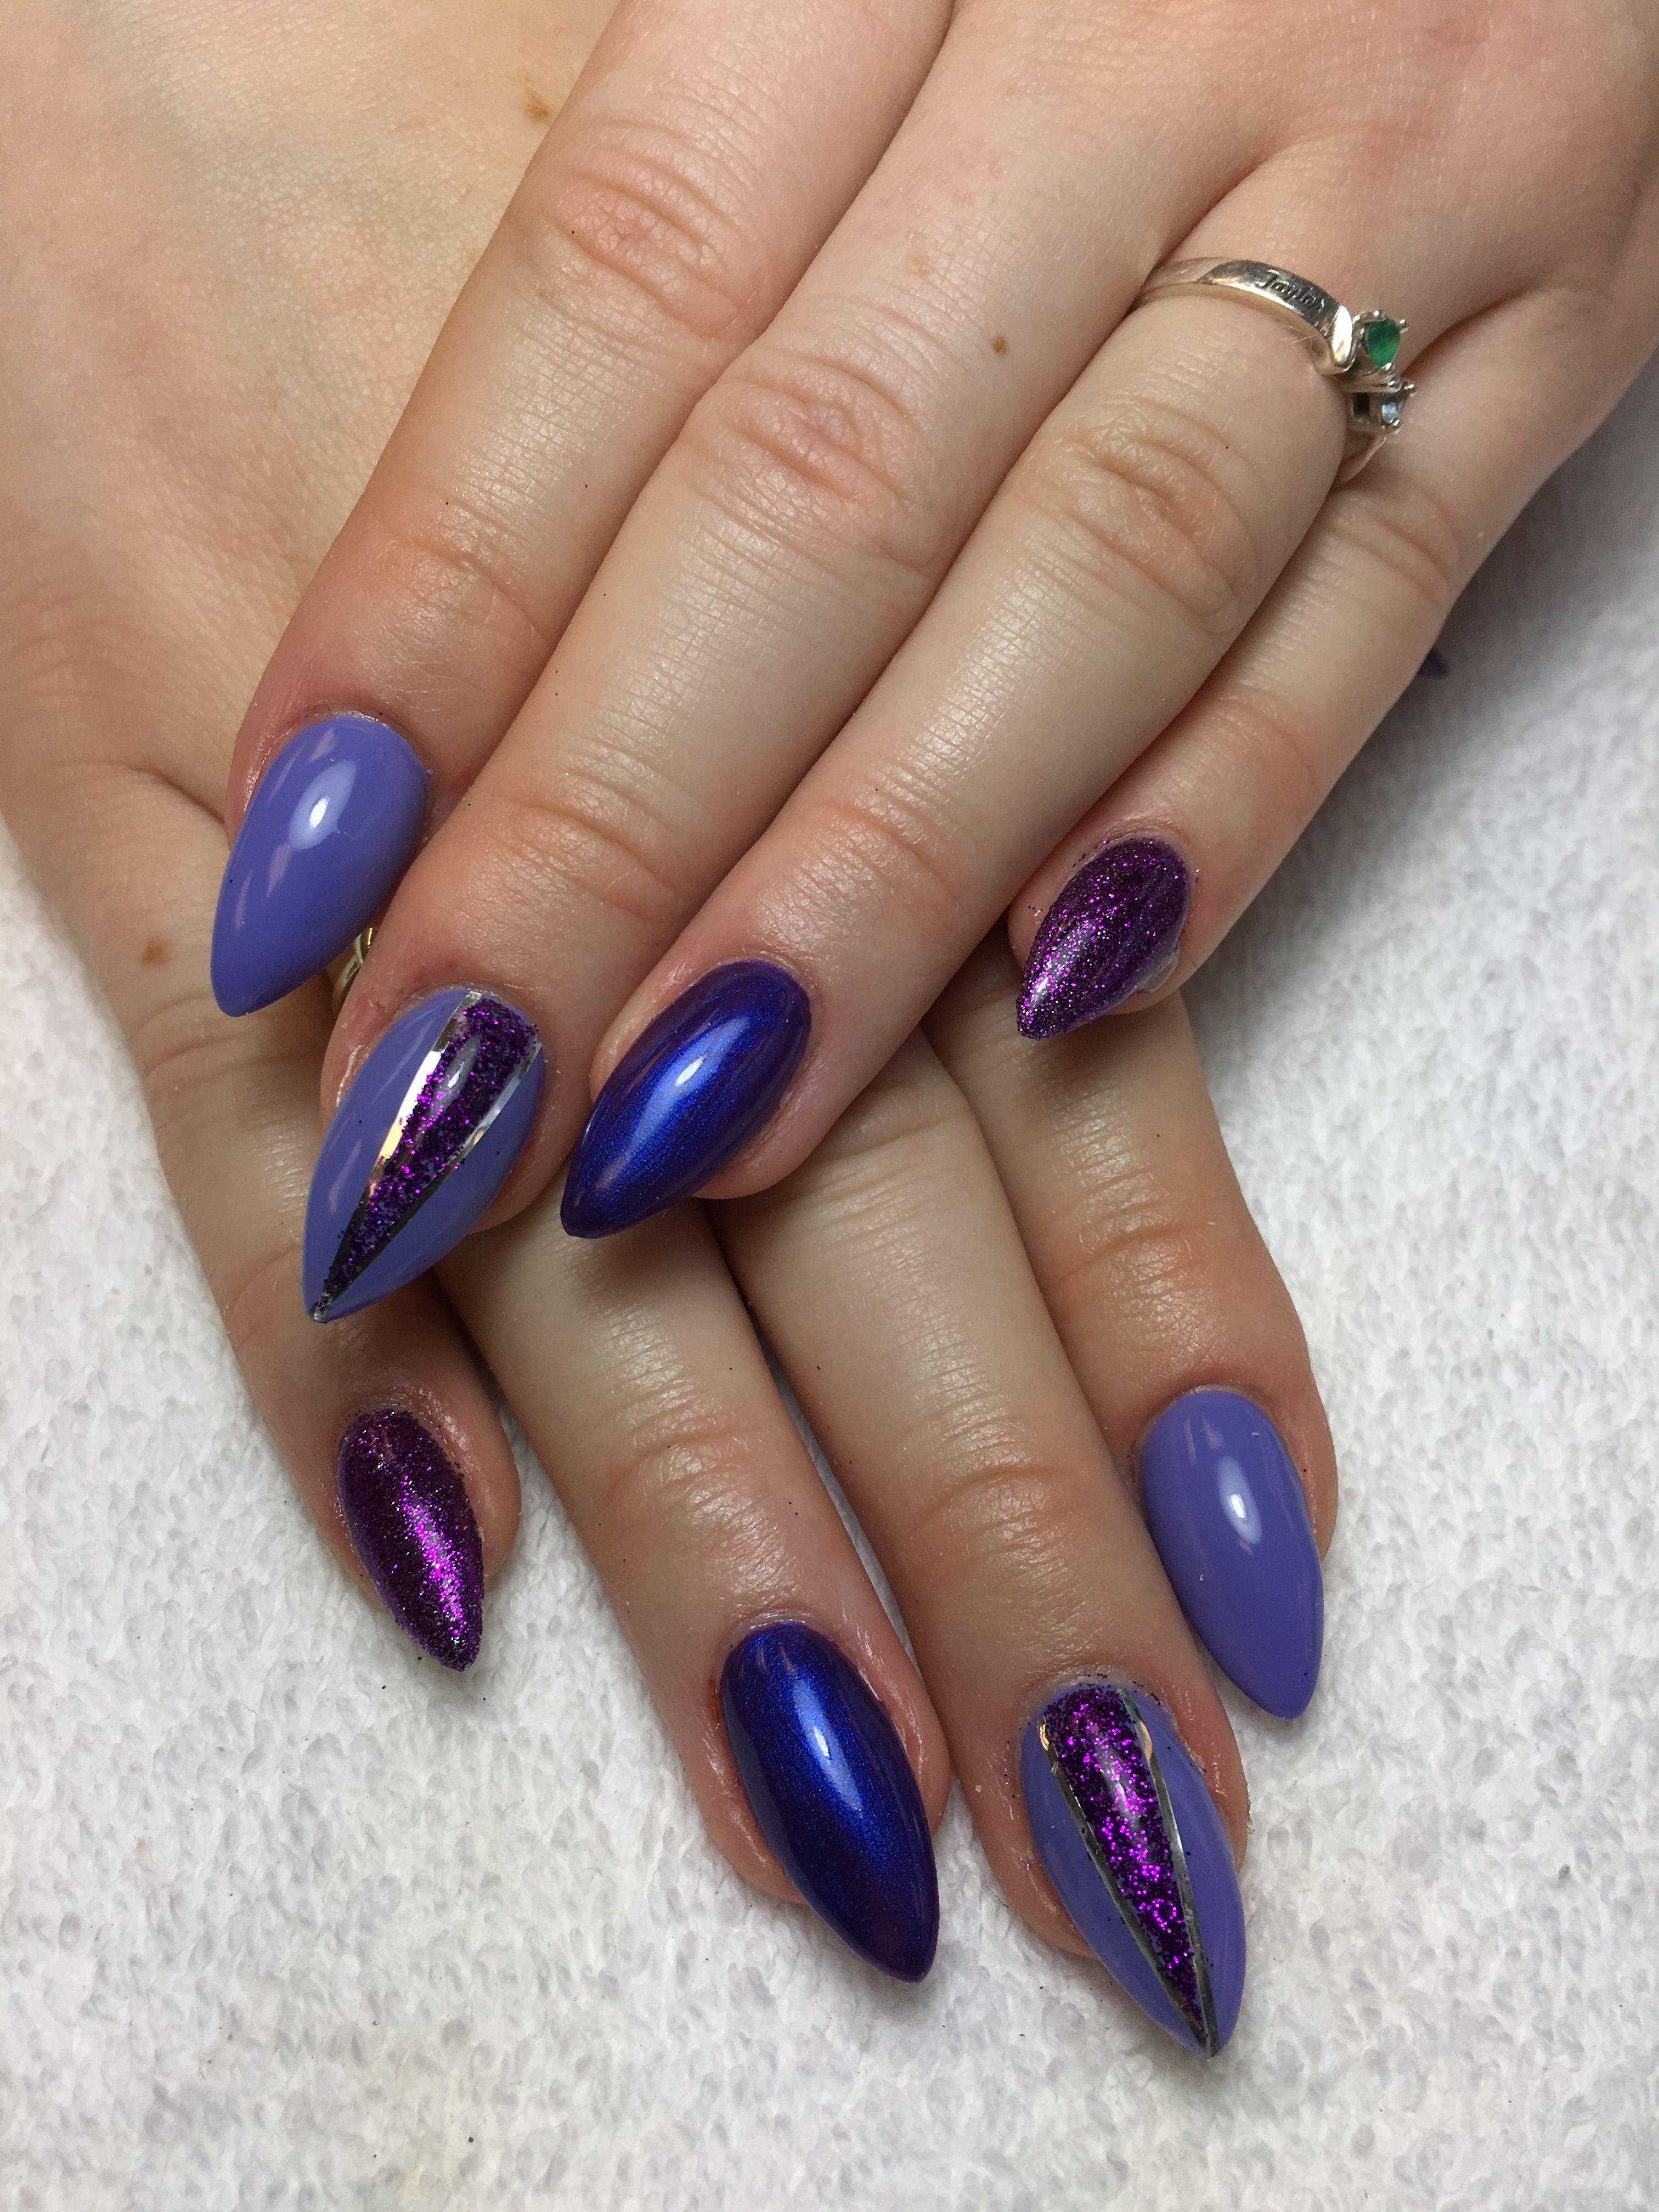 Stiletto nails, long nails, purple, glitter nails, gel nails | Nails ...